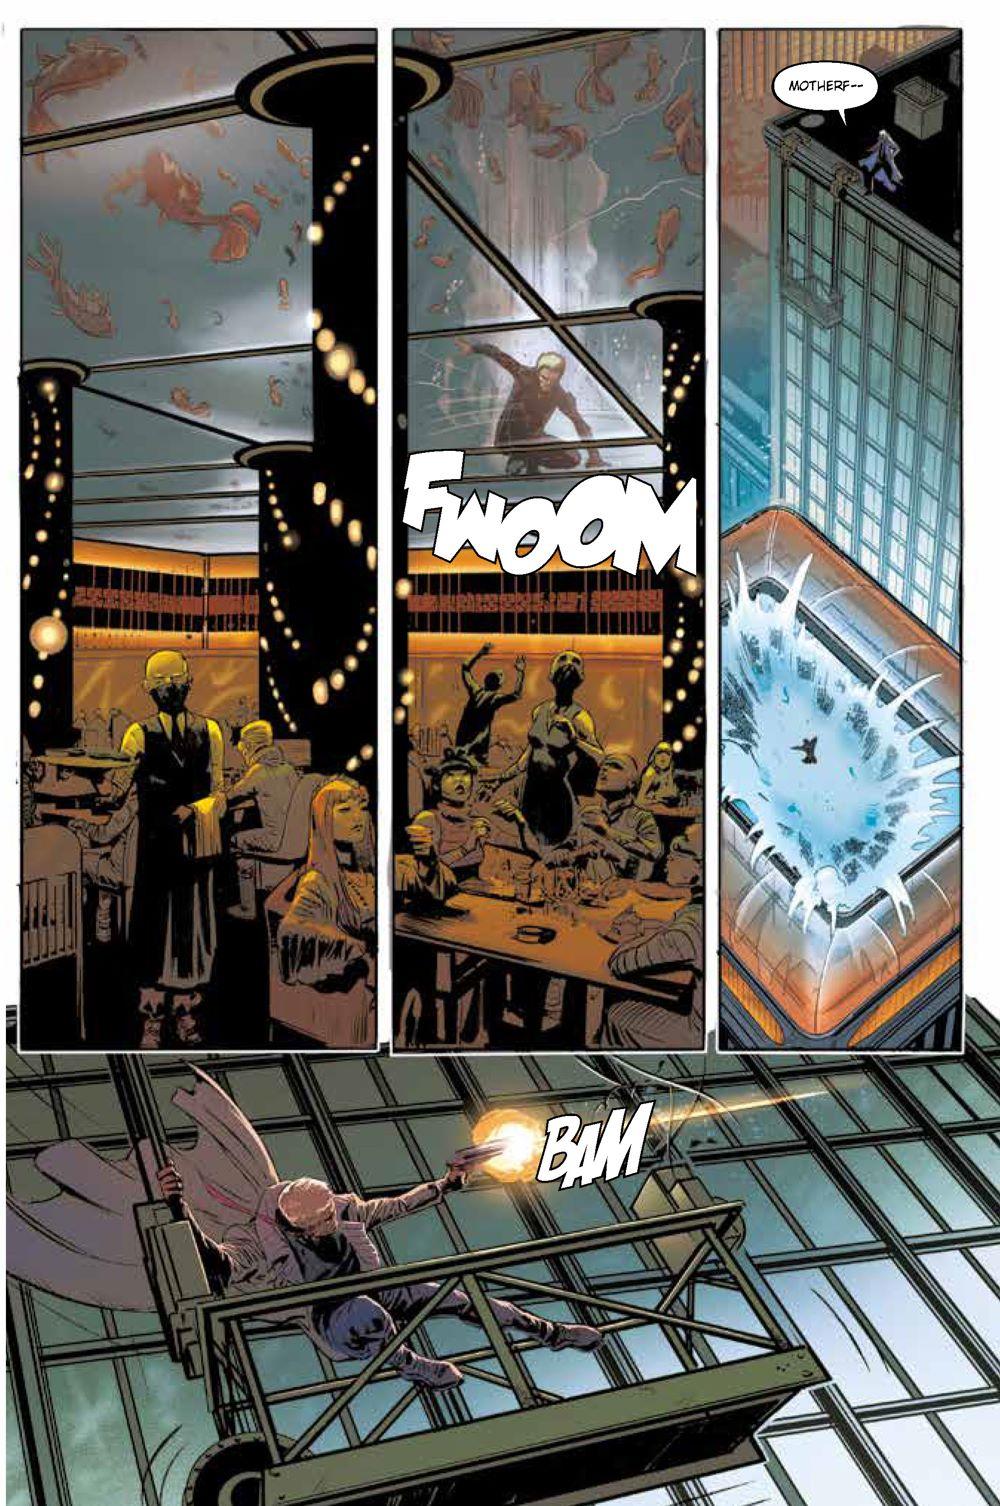 Blade_Runner_Origins_4_INT_Page_1 ComicList Previews: BLADE RUNNER ORIGINS #4